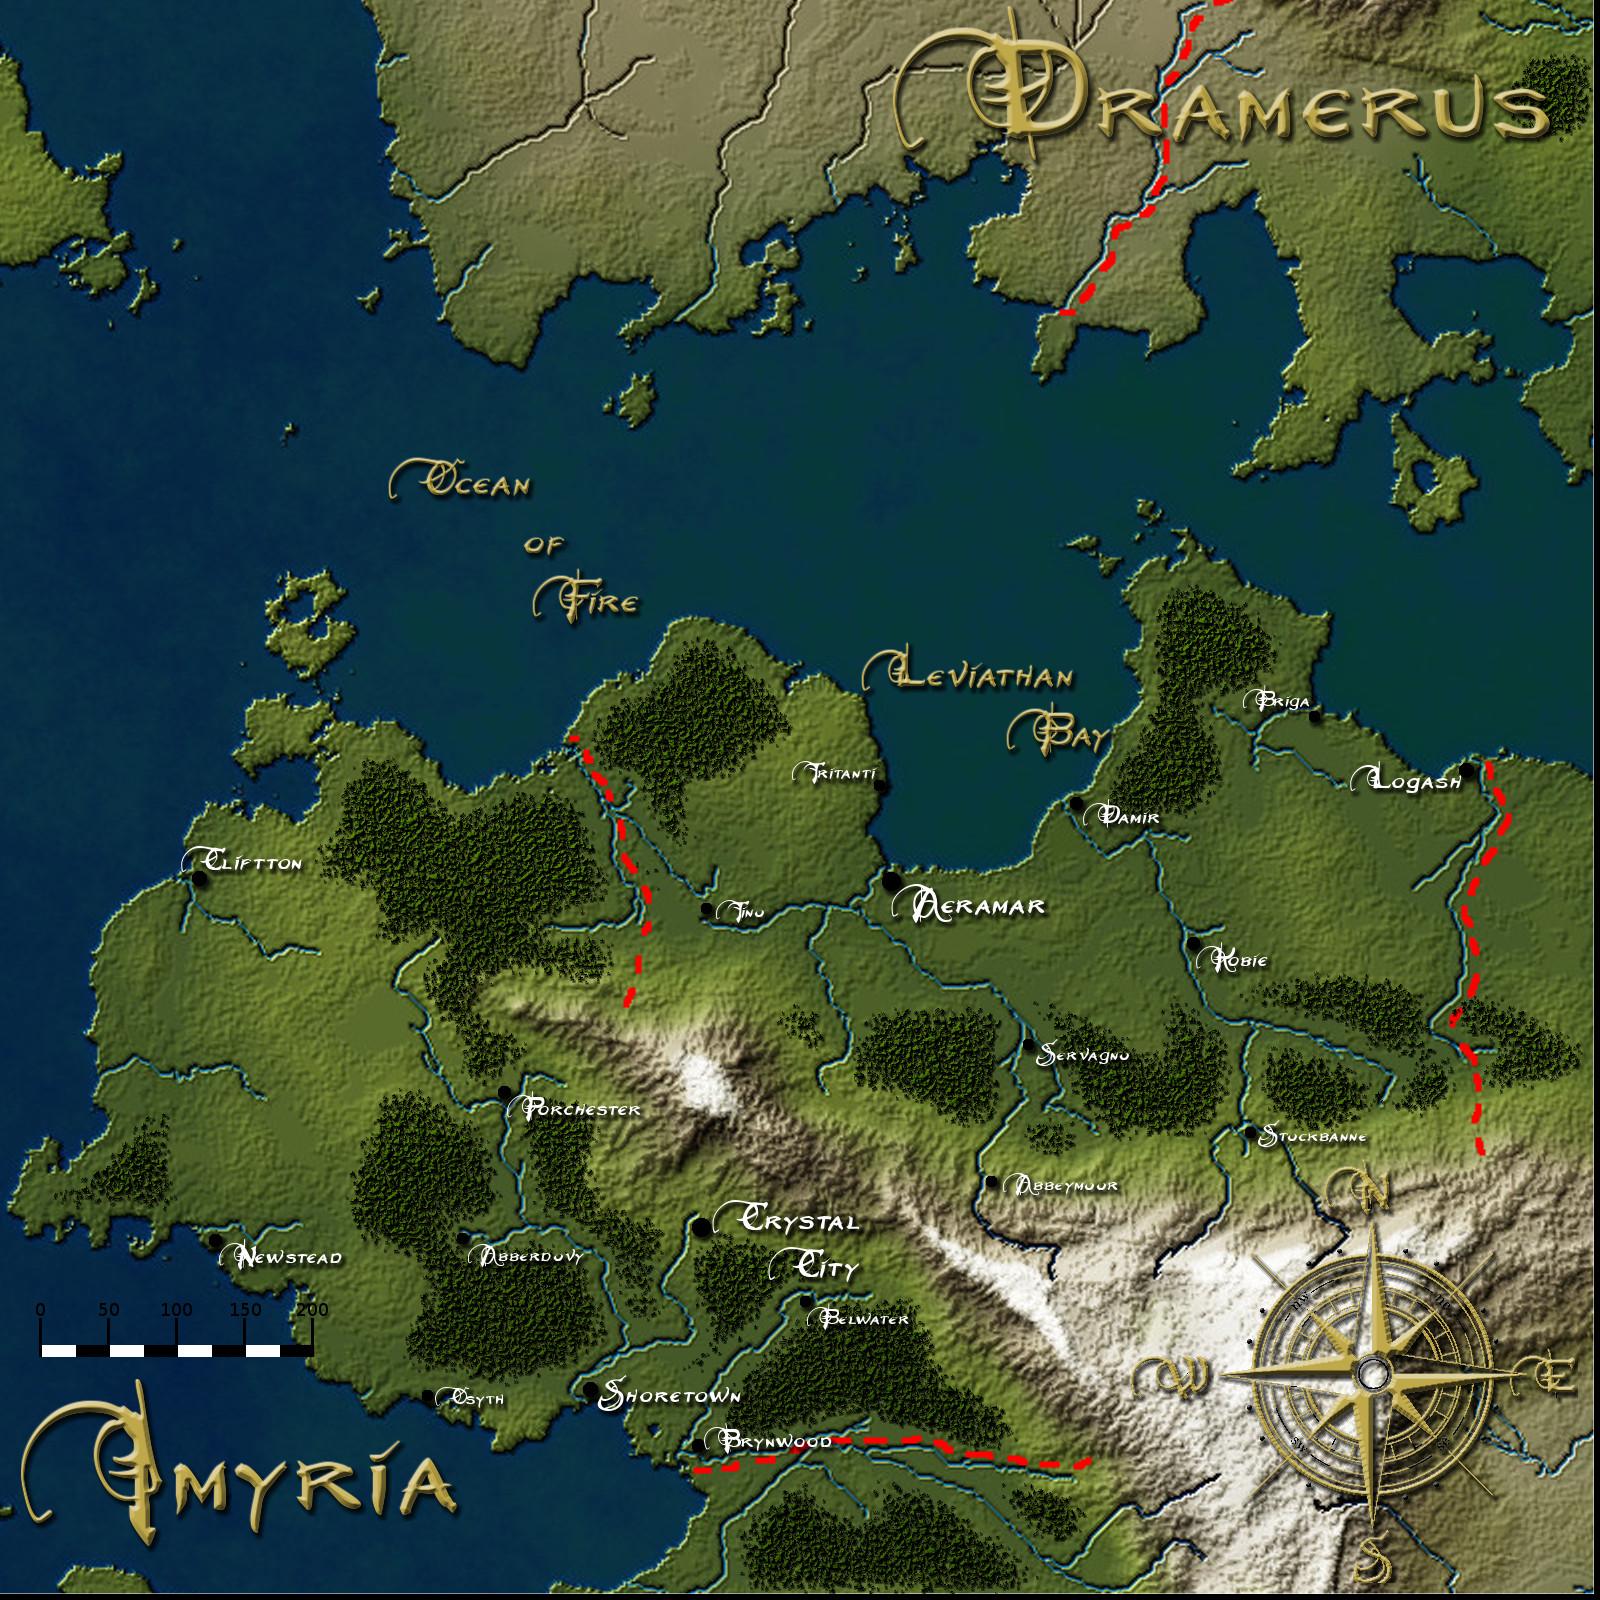 Imyria & Dramerus